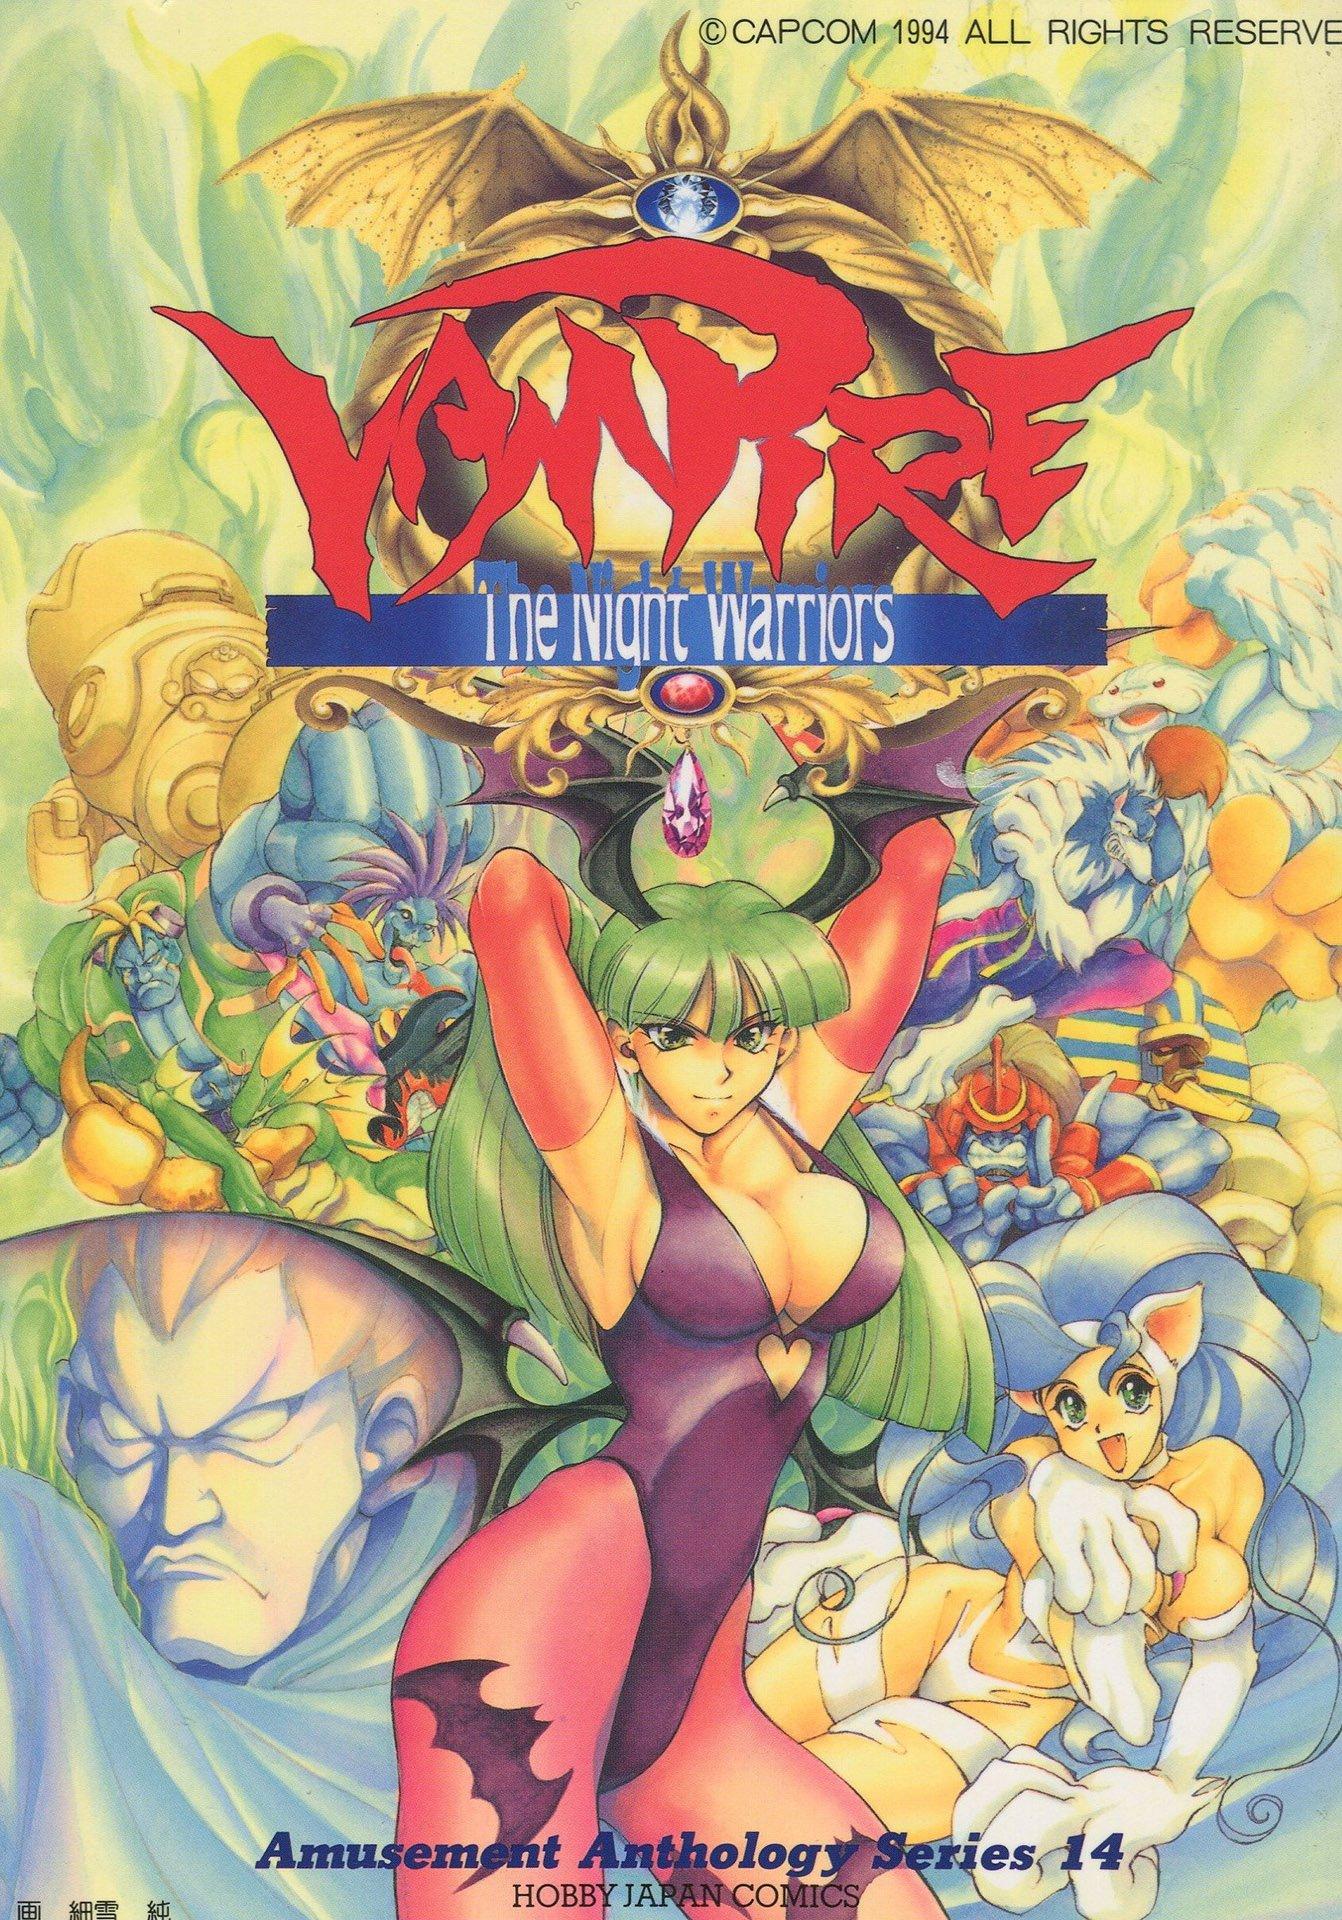 Vampire: The Night Warriors - Amusement Anthology Series 14 (1995)